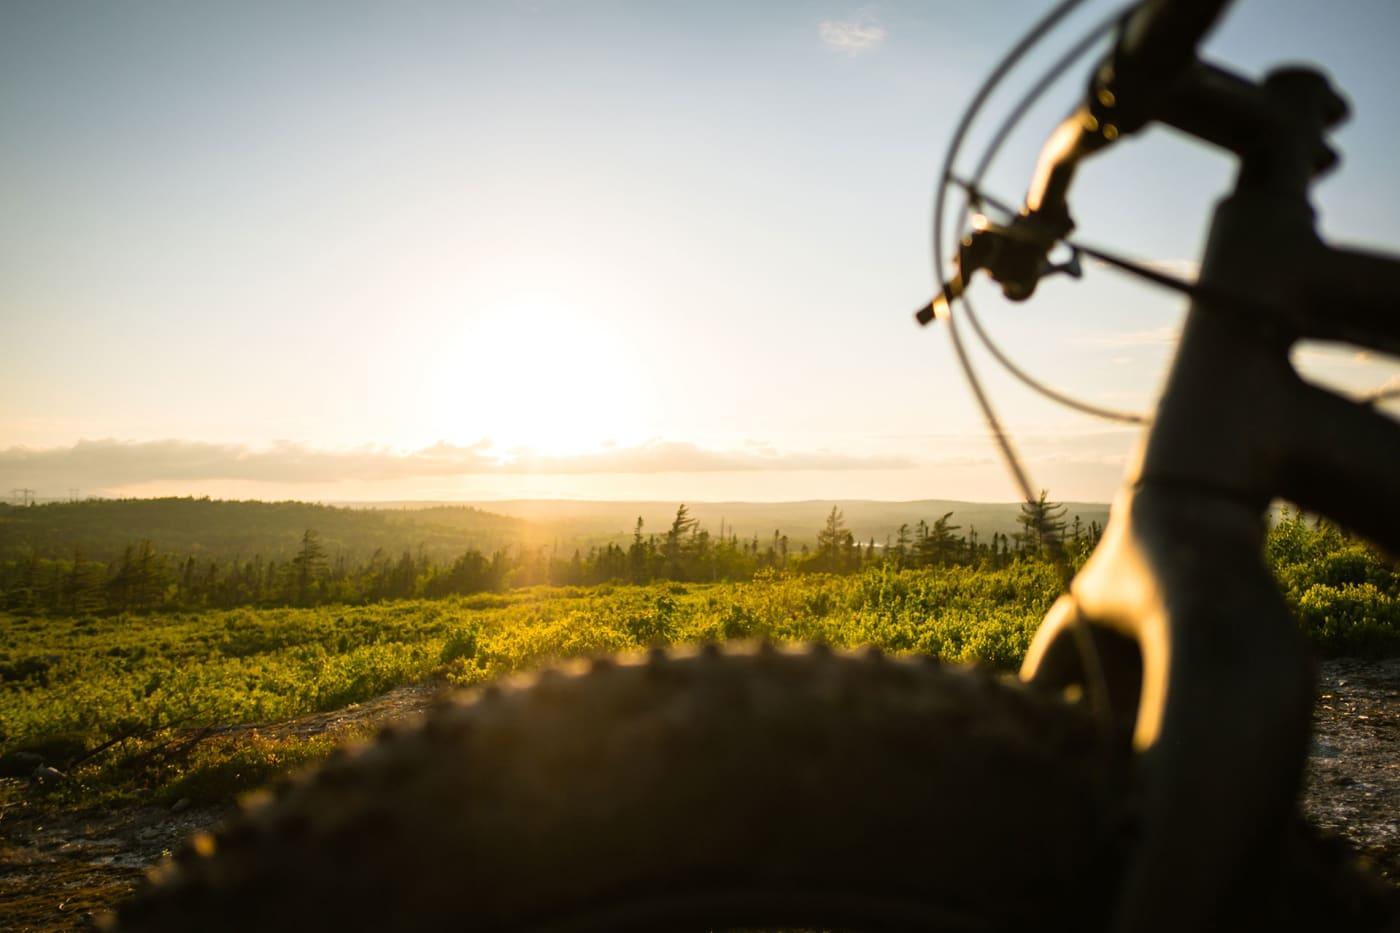 Riding a bike at Bayer's Lake, Halifax, Nova Scotia